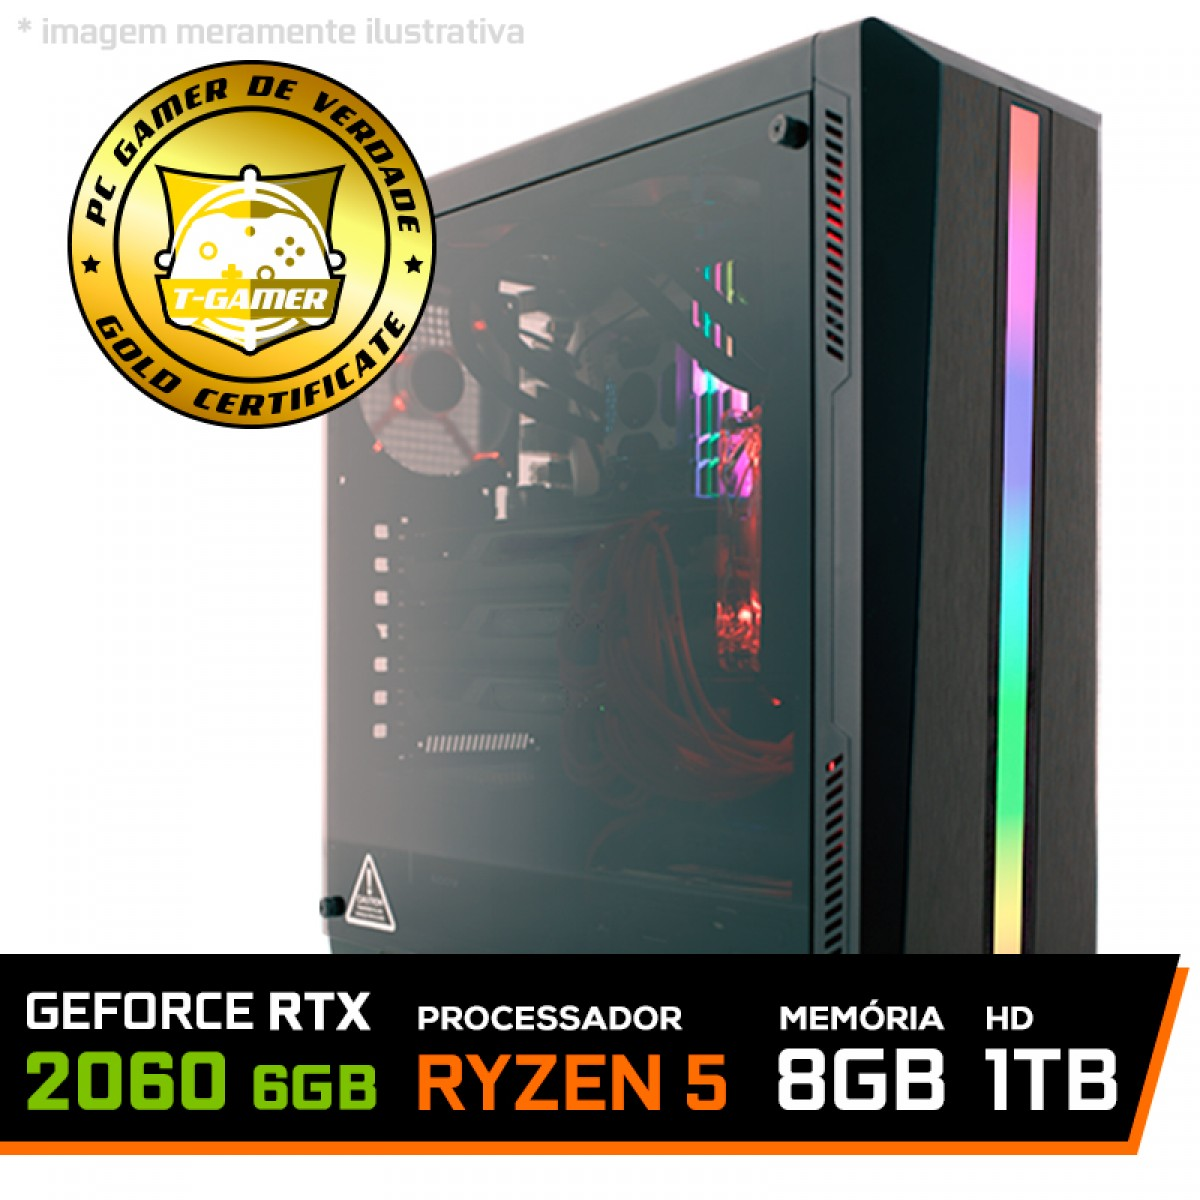 Pc Gamer T-Commander Lvl-3 Amd Ryzen 5 2600 / GeForce RTX 2060 6GB / DDR4 8GB / HD 1TB / 600W